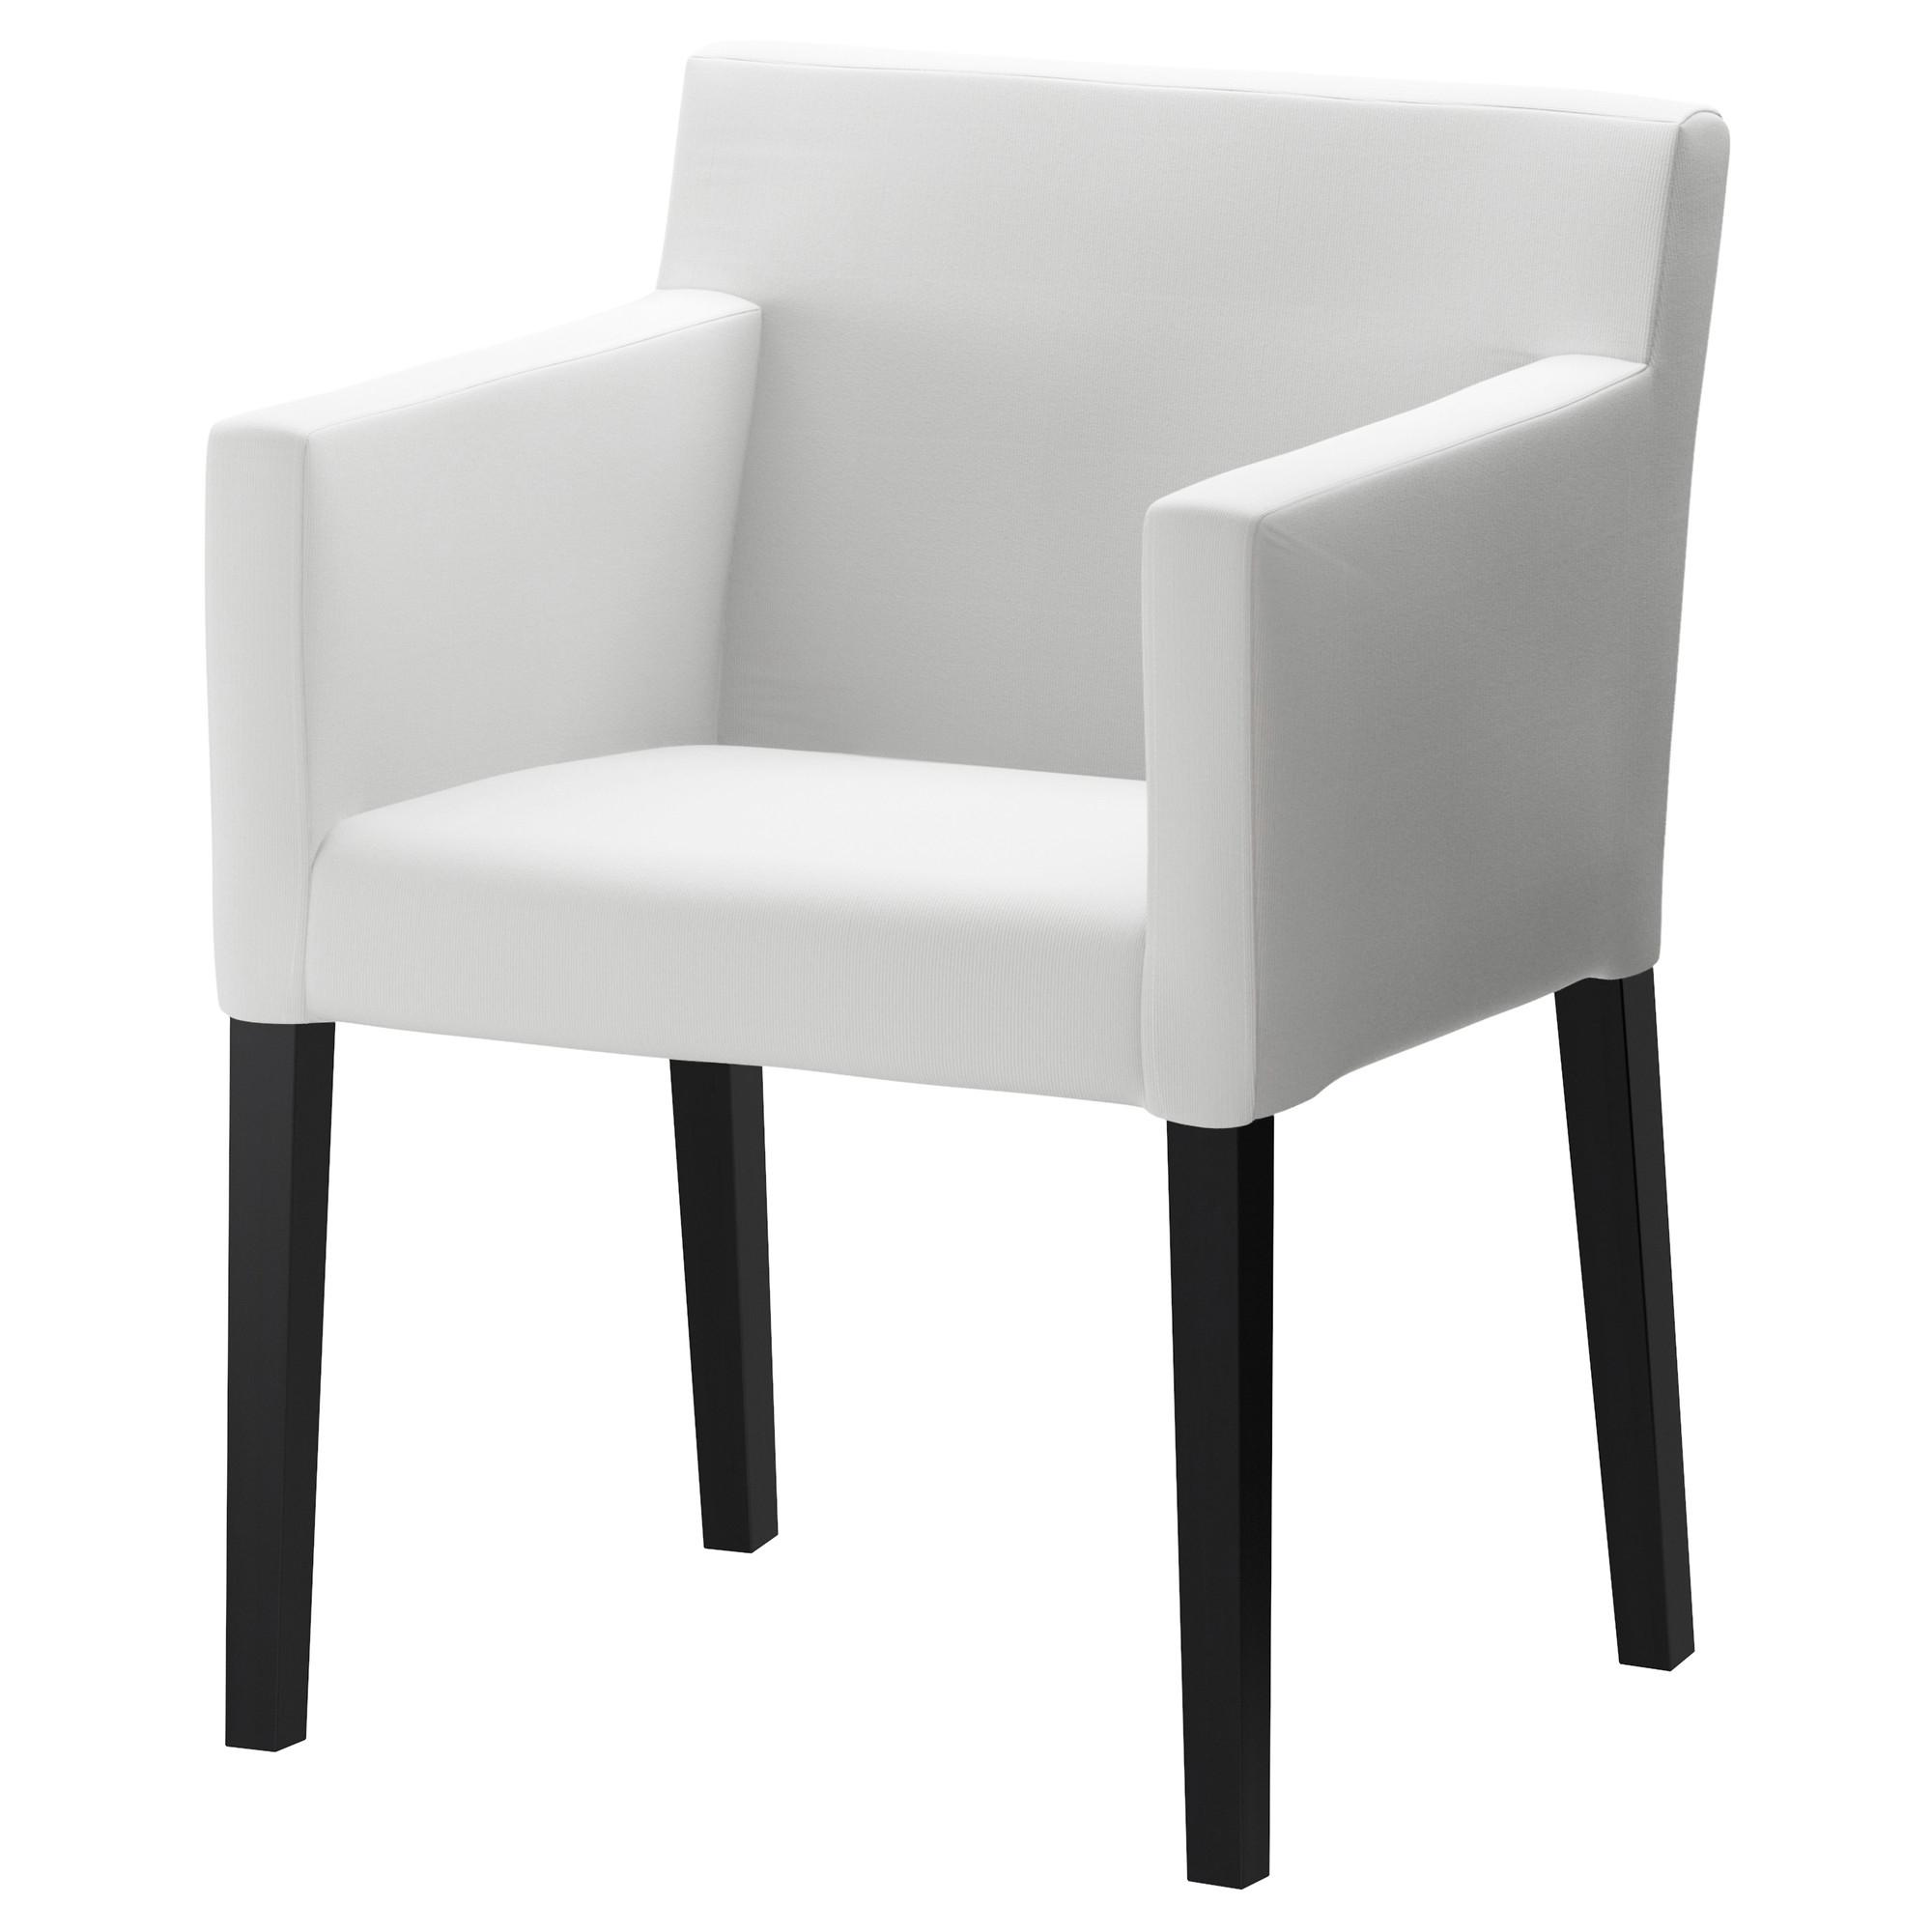 Nils silla con reposabrazos blekinge blanco for Sillas tapizadas con reposabrazos